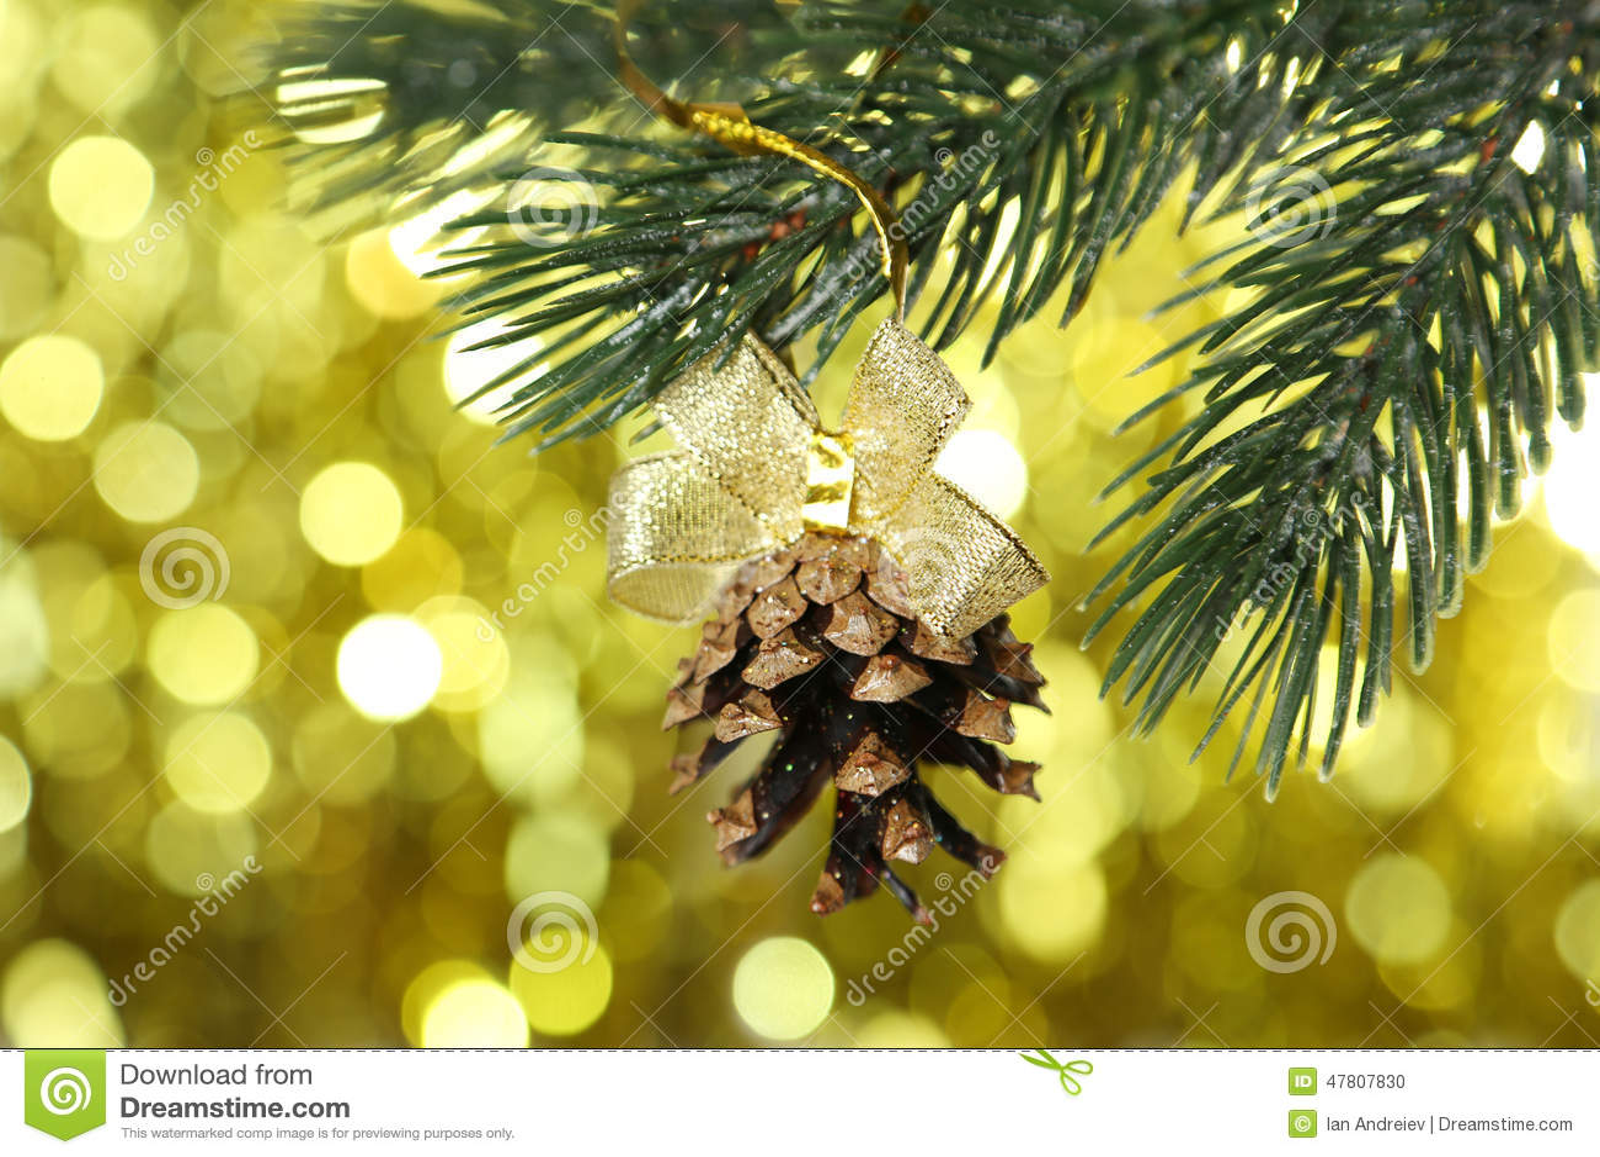 Christmas Pinecone On Christmas Tree On Lights Background Stock ...